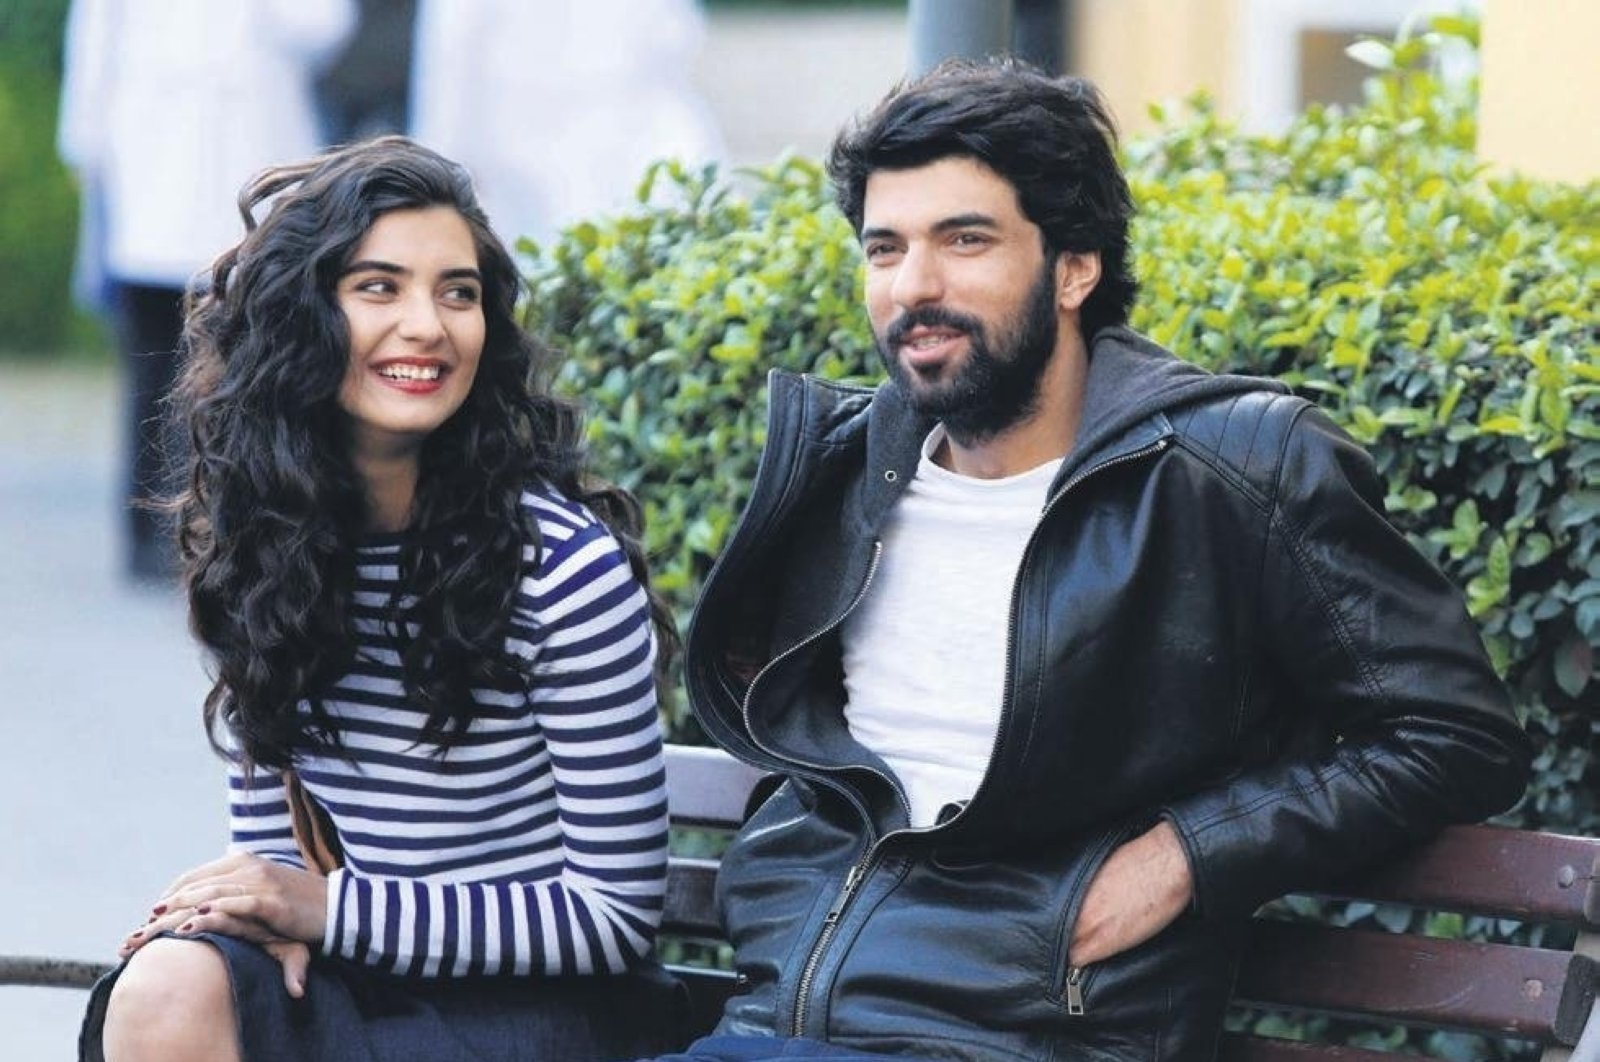 A still shot shows actress Tuba Büyüküstün (L) and Engin Akyürek in a scene from 'Kara Para Aşk.'